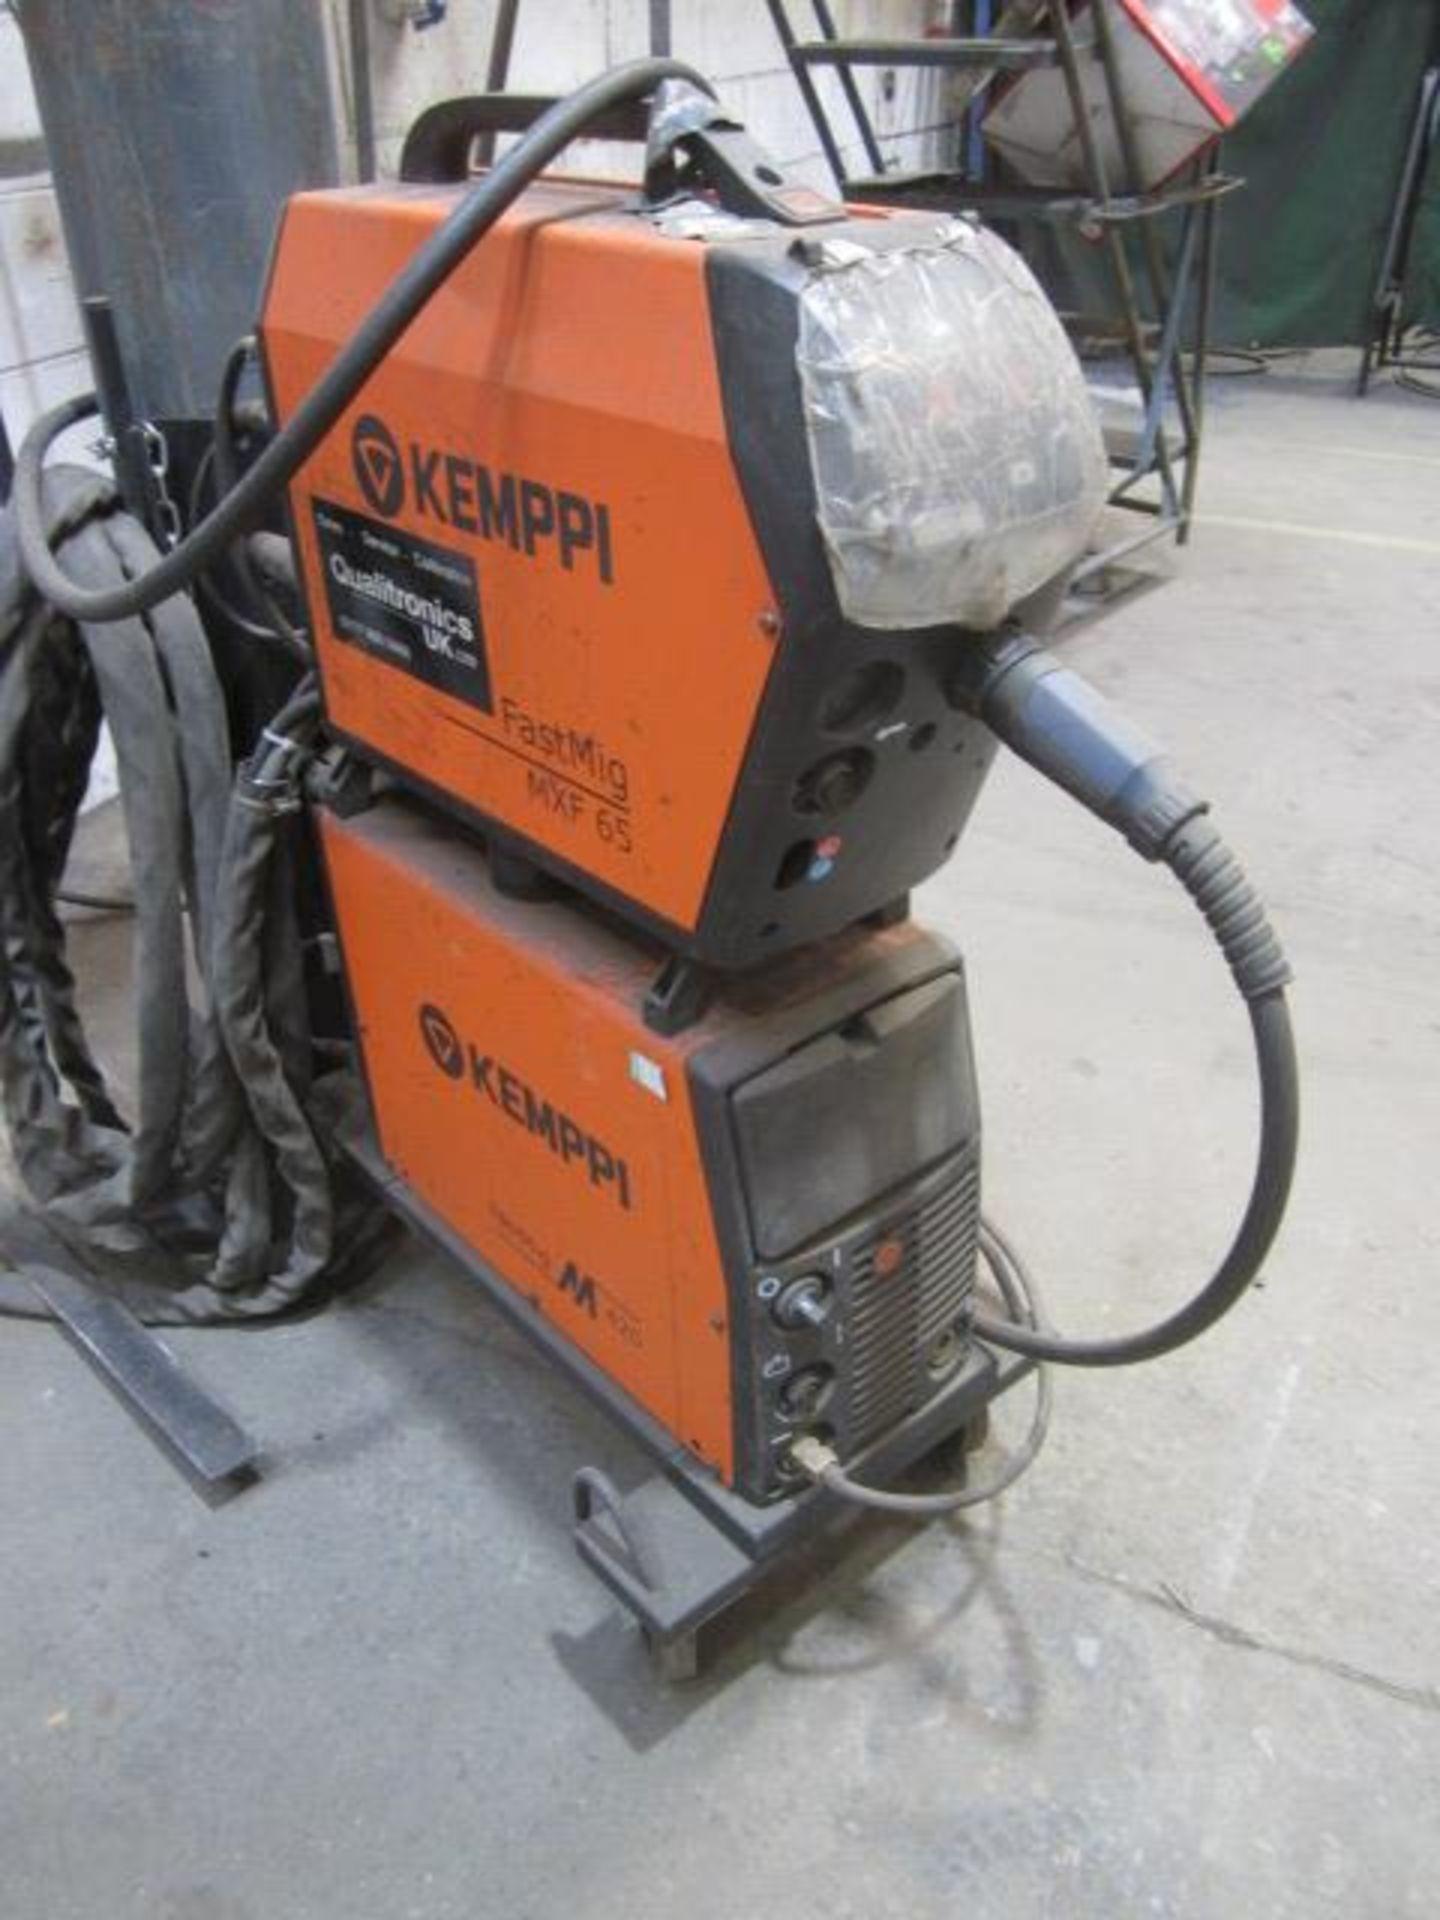 Kemppi Fast Mig M420 mig welder, serial no. 2694679, with Fast Mig MXF65 wire feeder, serial no.